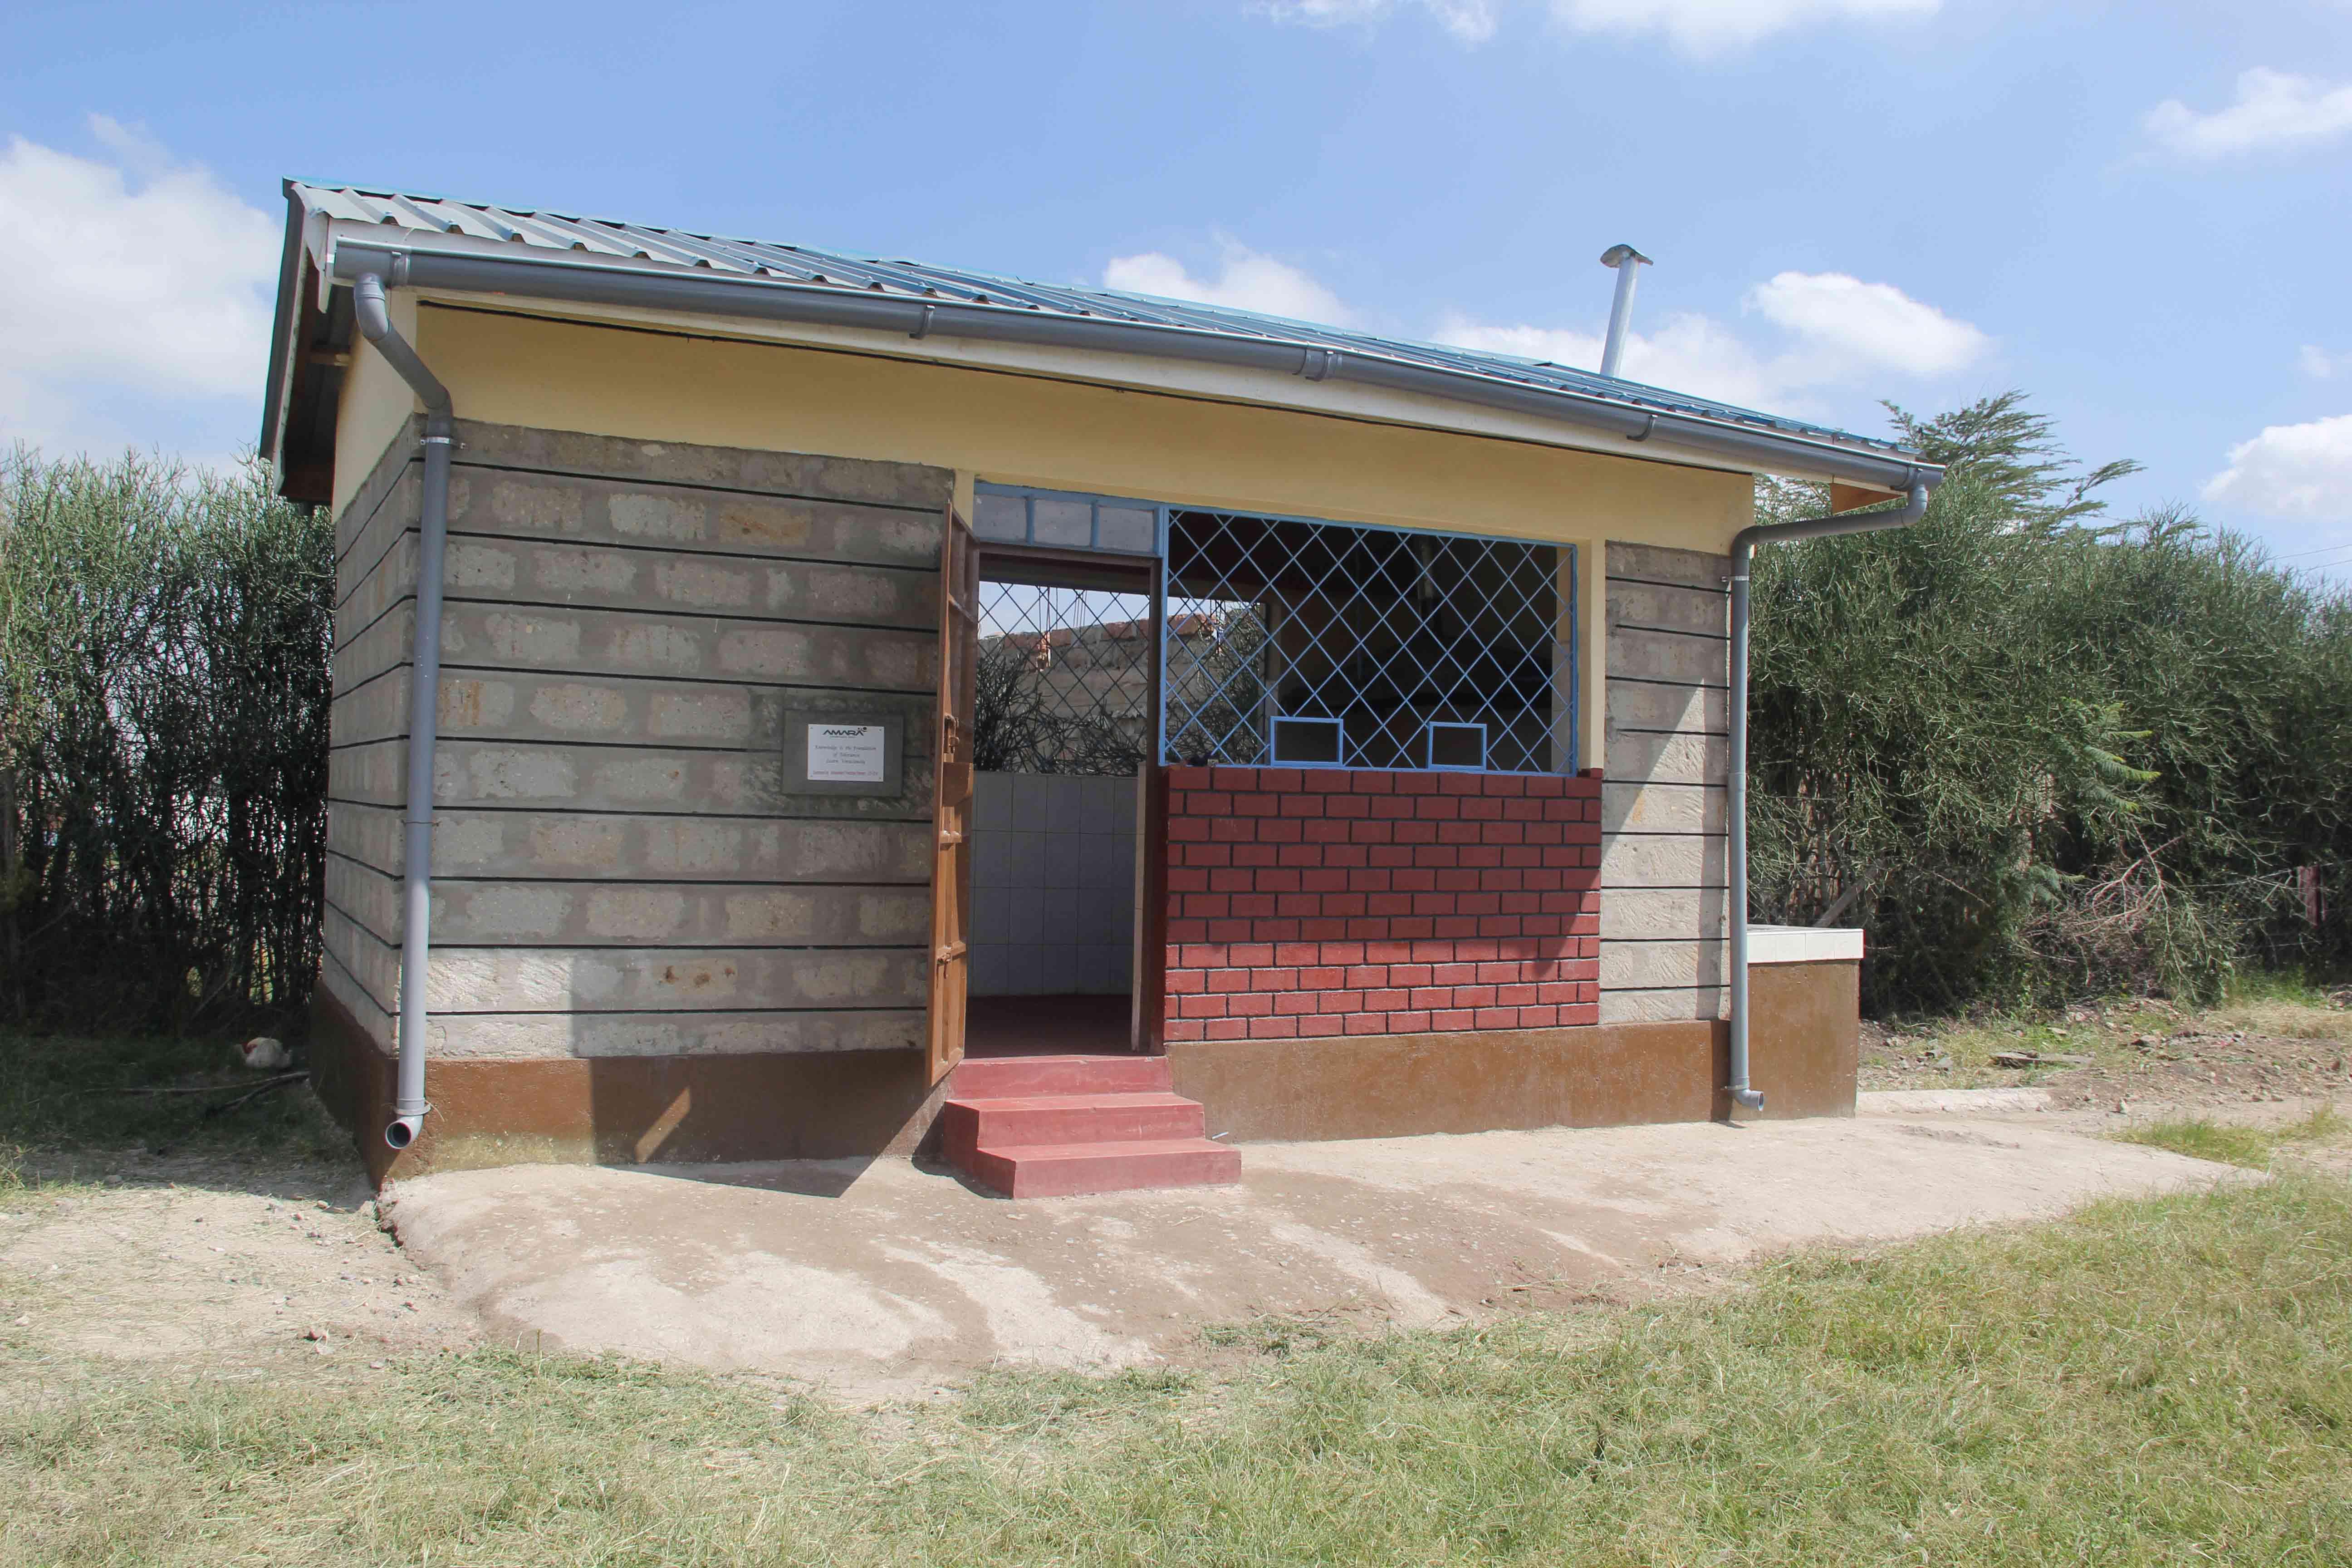 Kitchen-&-Store-for-Kanaani-Primary-Sch